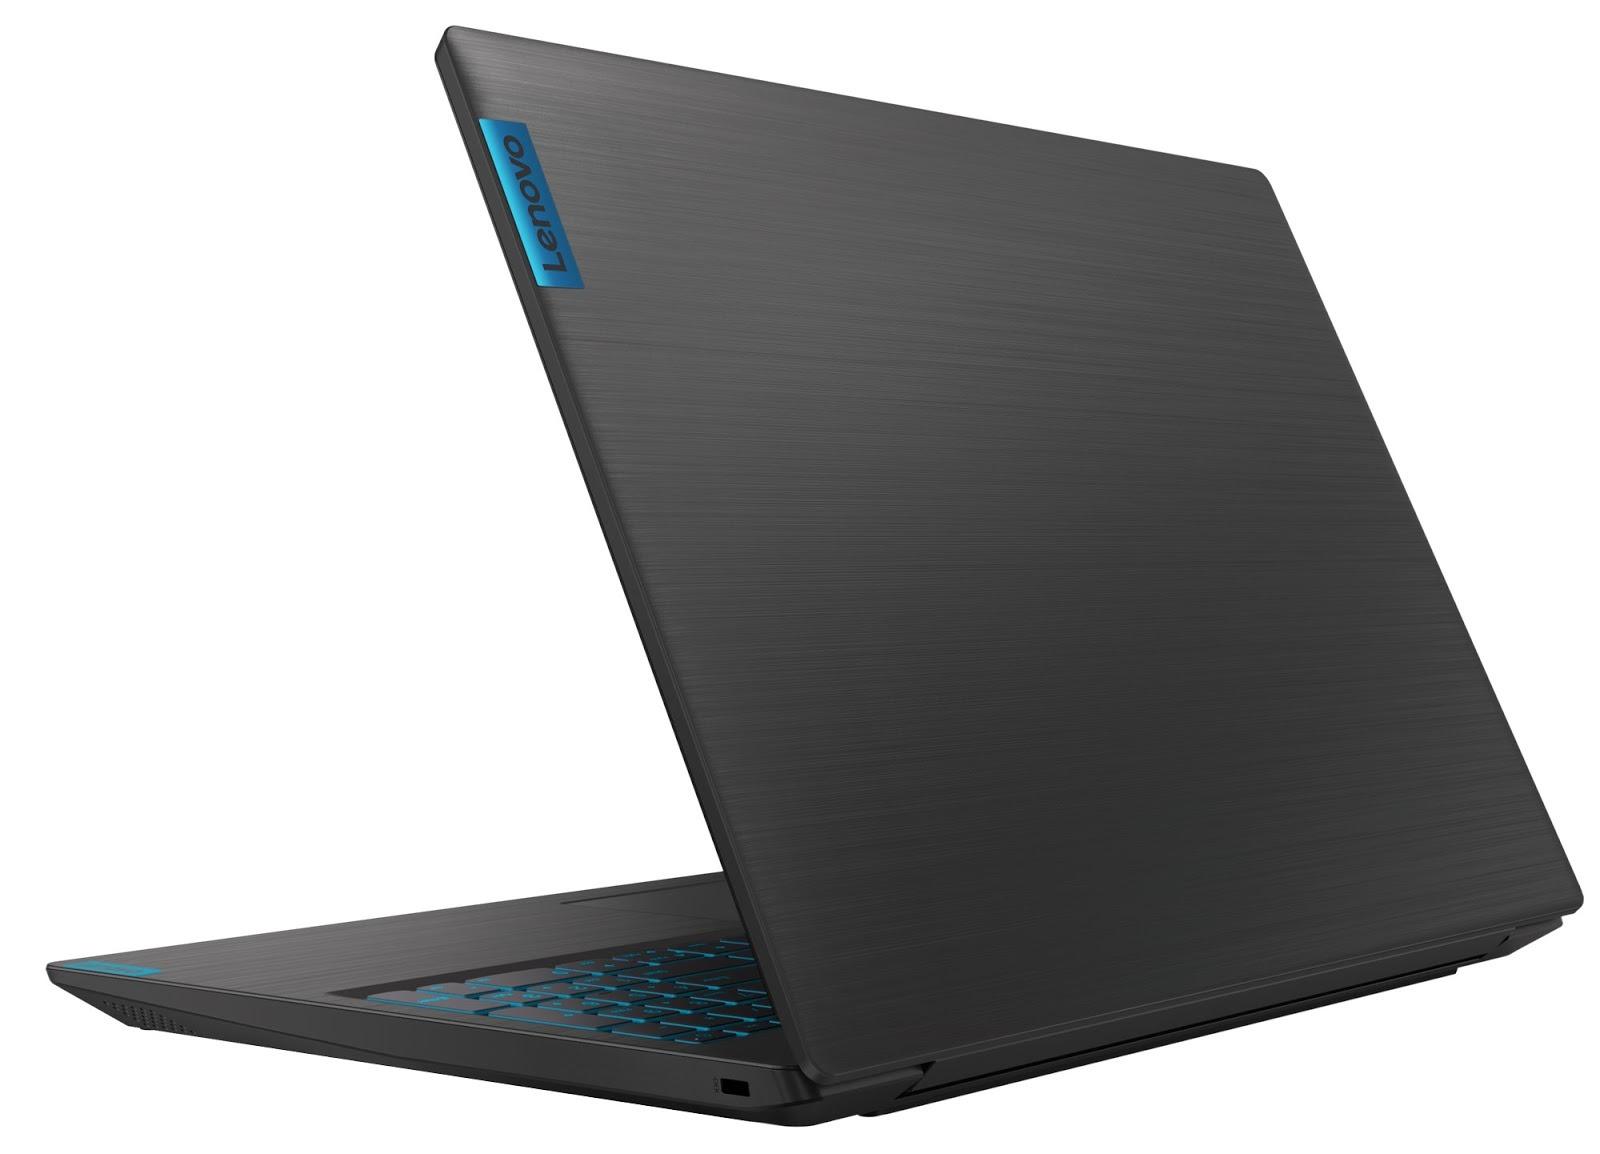 Фото 4. Ноутбук Lenovo ideapad L340-15IRH Gaming Granite Black (81LK01ALRE)